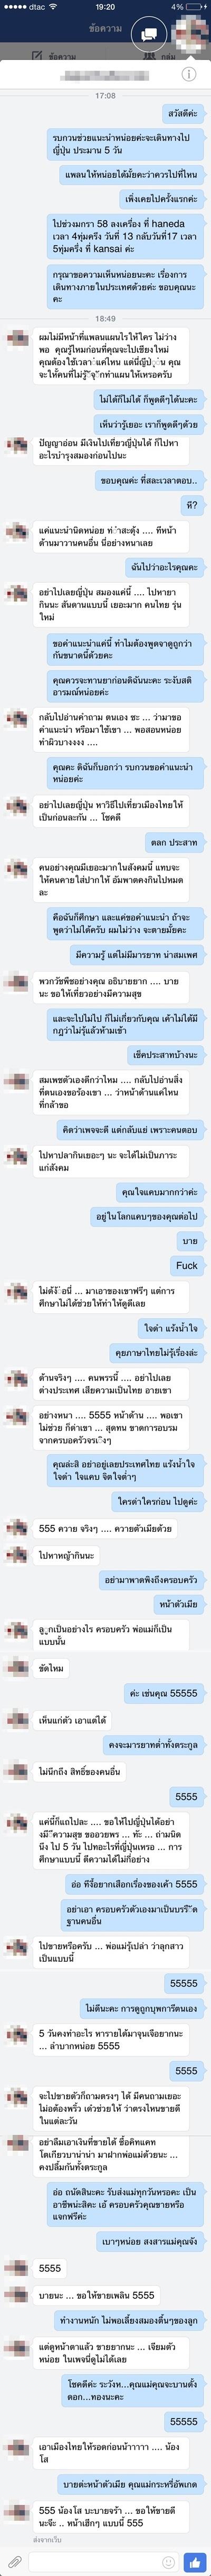 chat-all-ttt